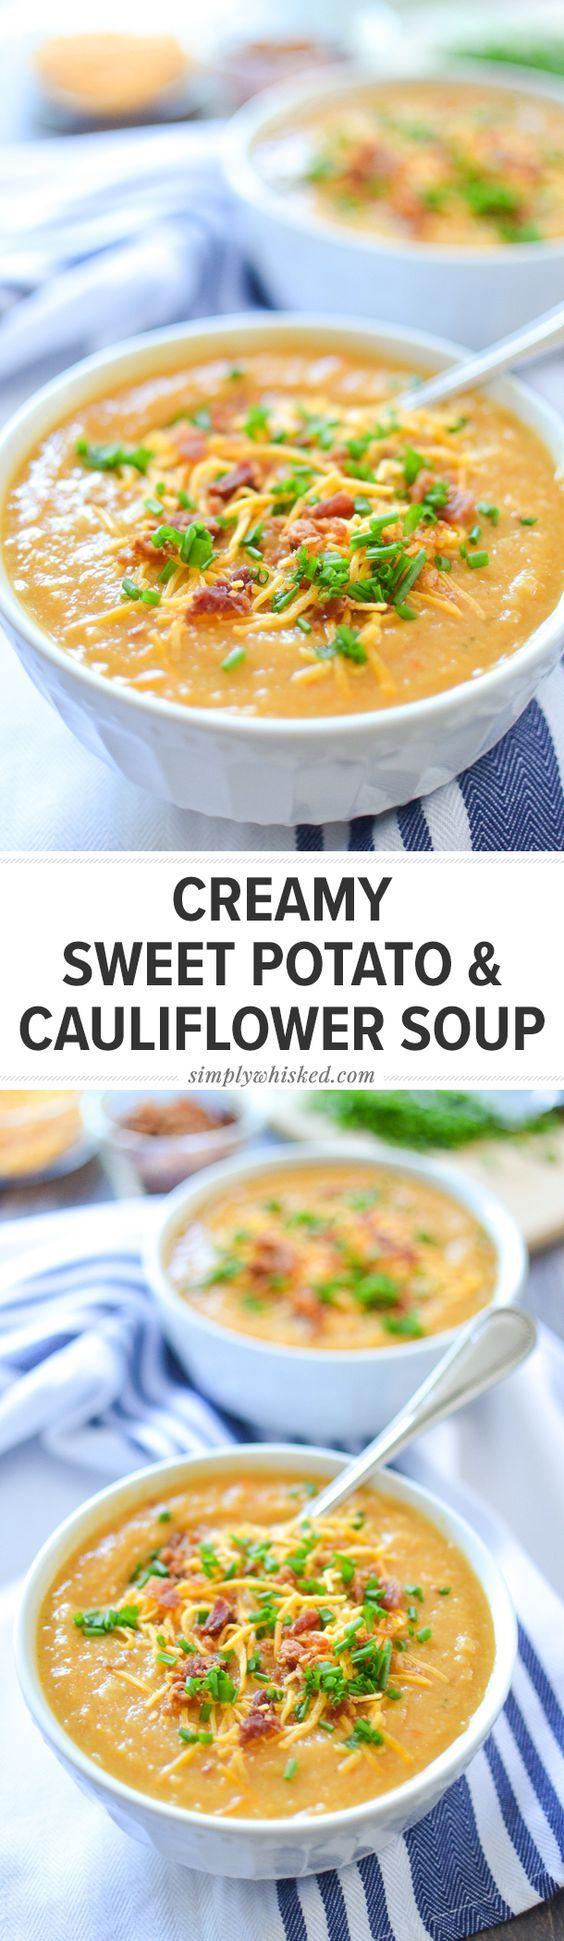 Creamy Sweet Potato & Cauliflower Soup   @simplywhisked